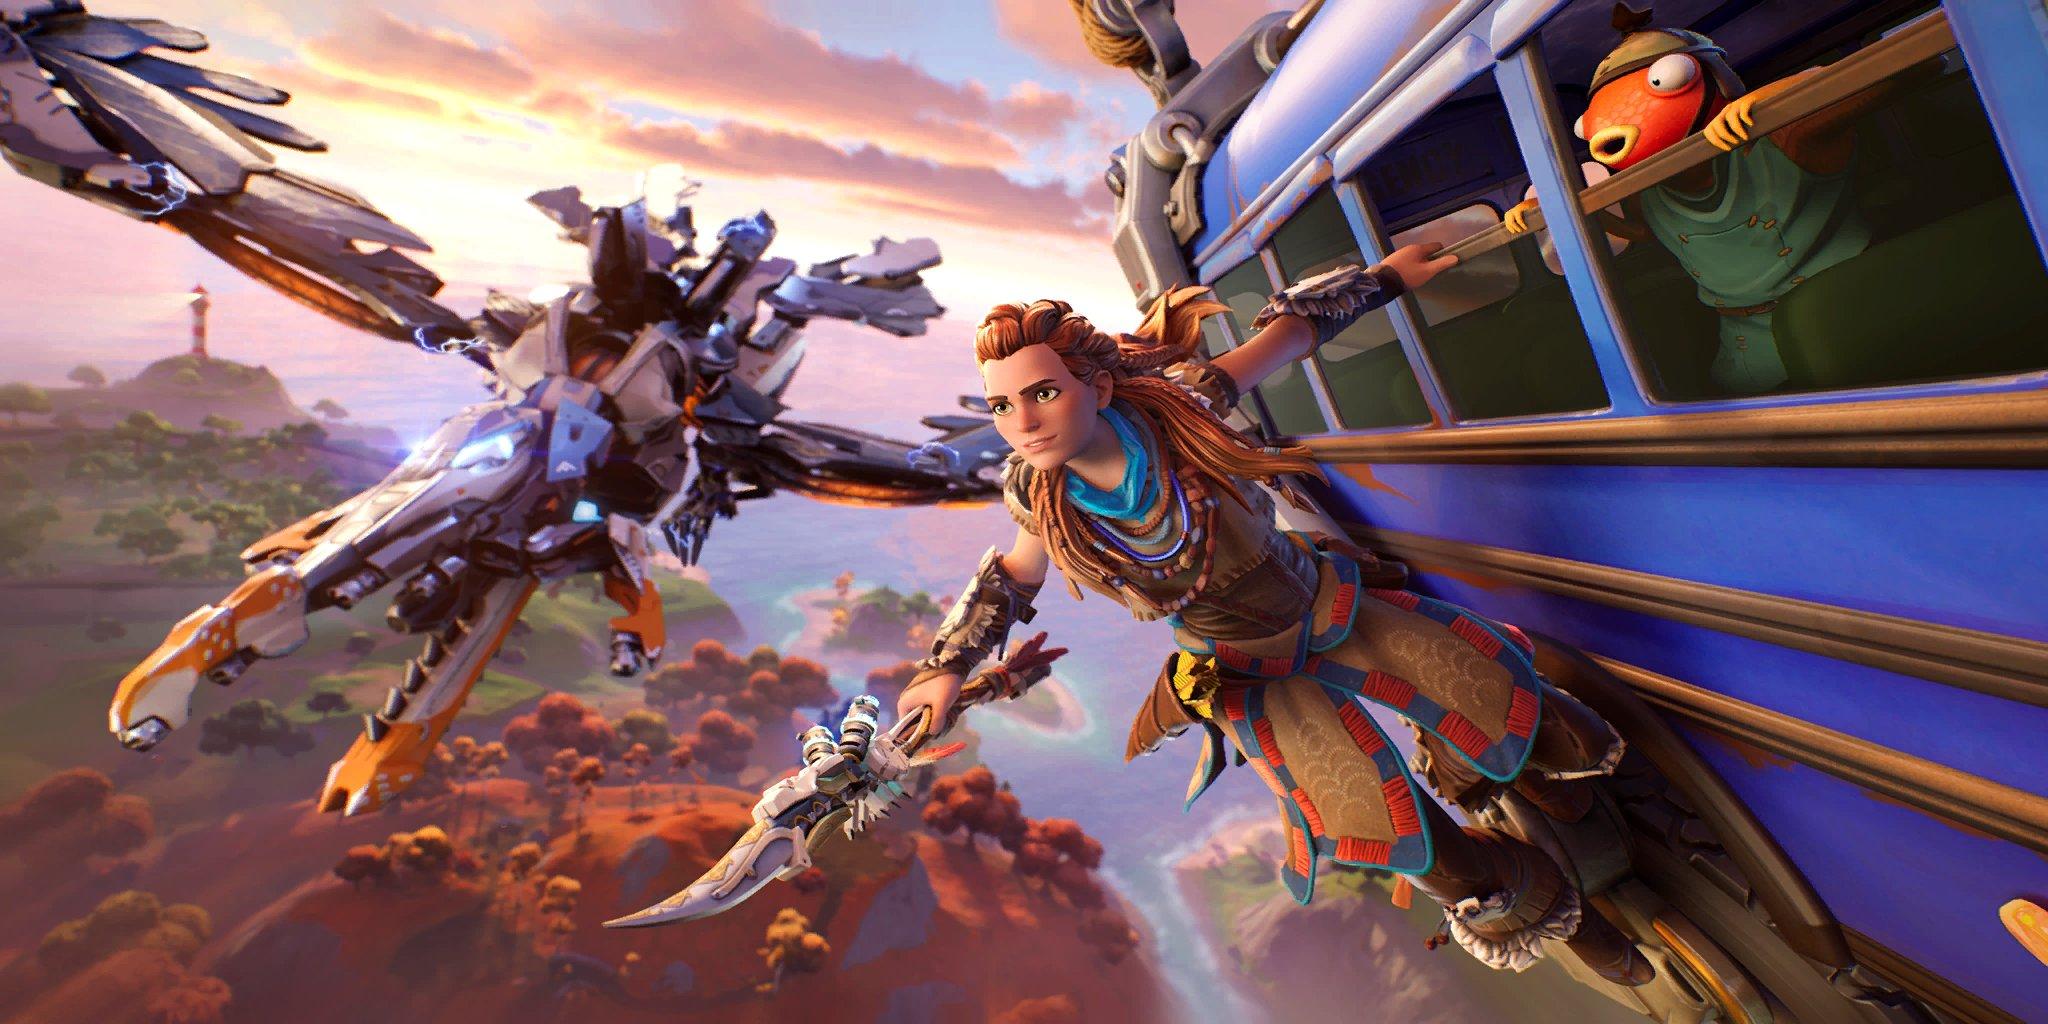 Элой из Horizon Zero Dawn в королевской битве Fortnite /фото twitter.com/shiinabr